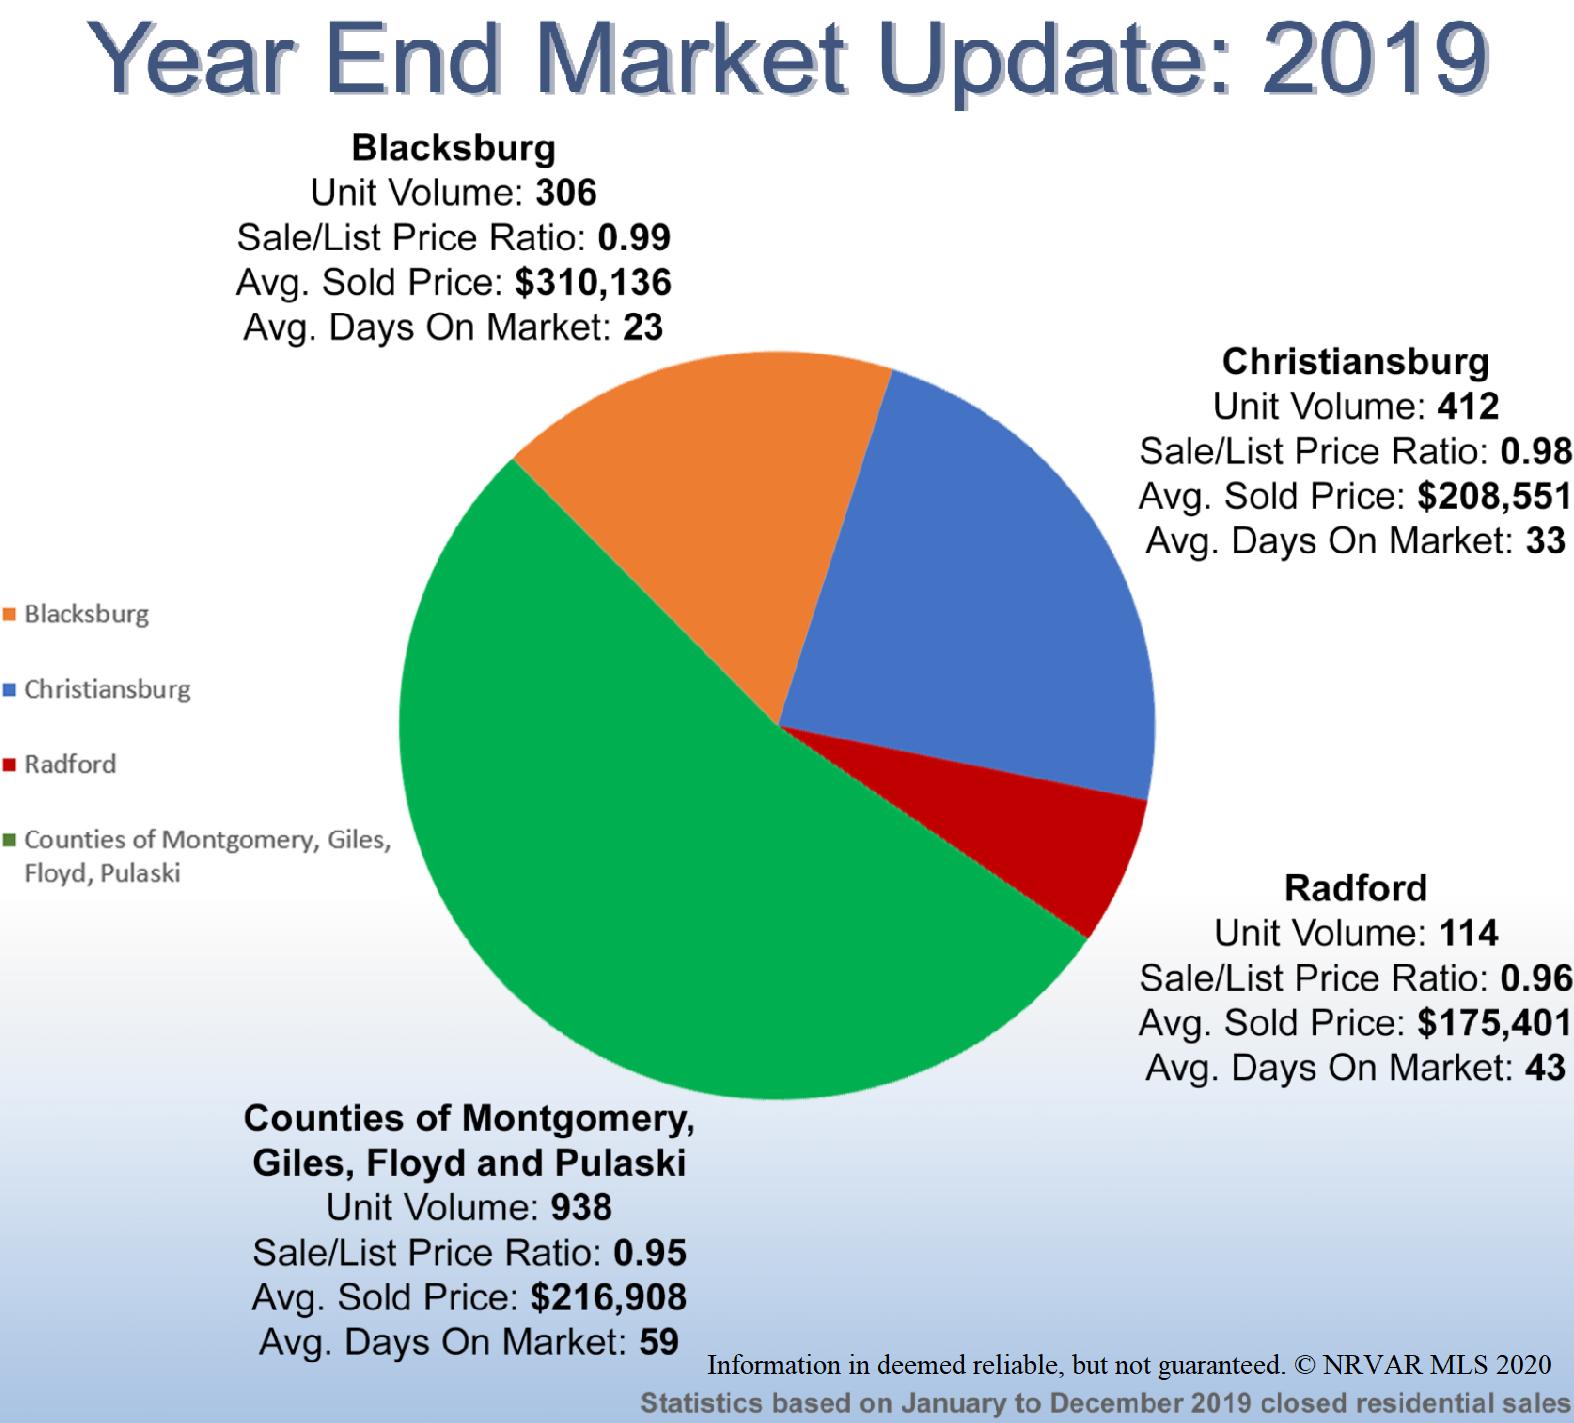 2019 Market Statistics